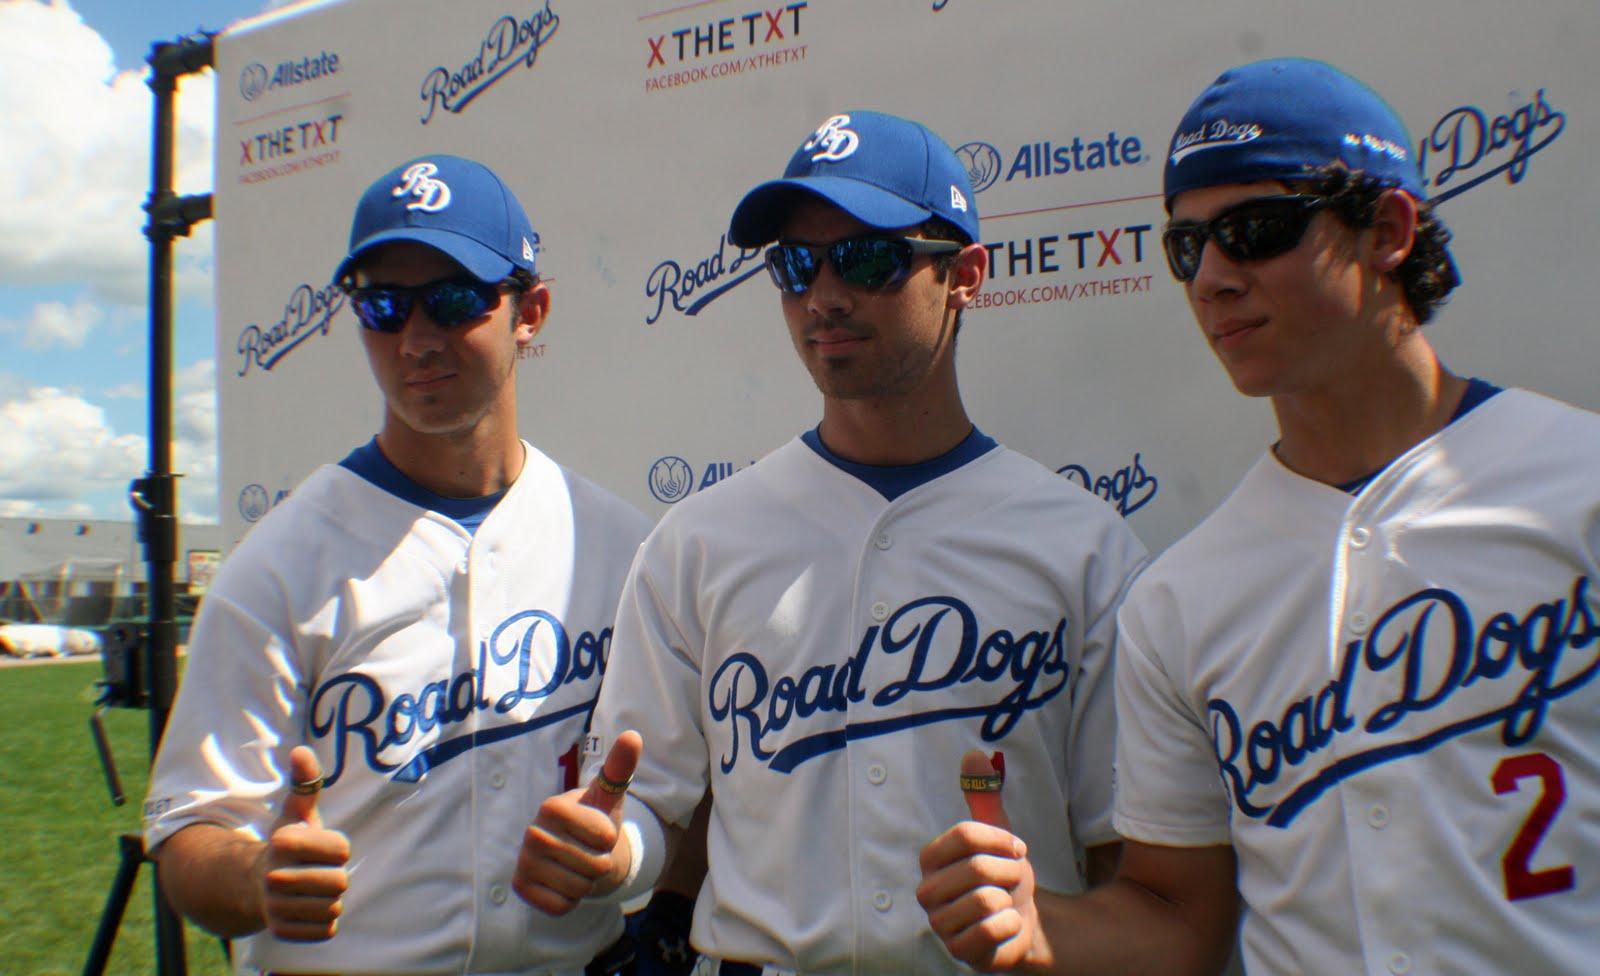 Jonas brothers threesome story